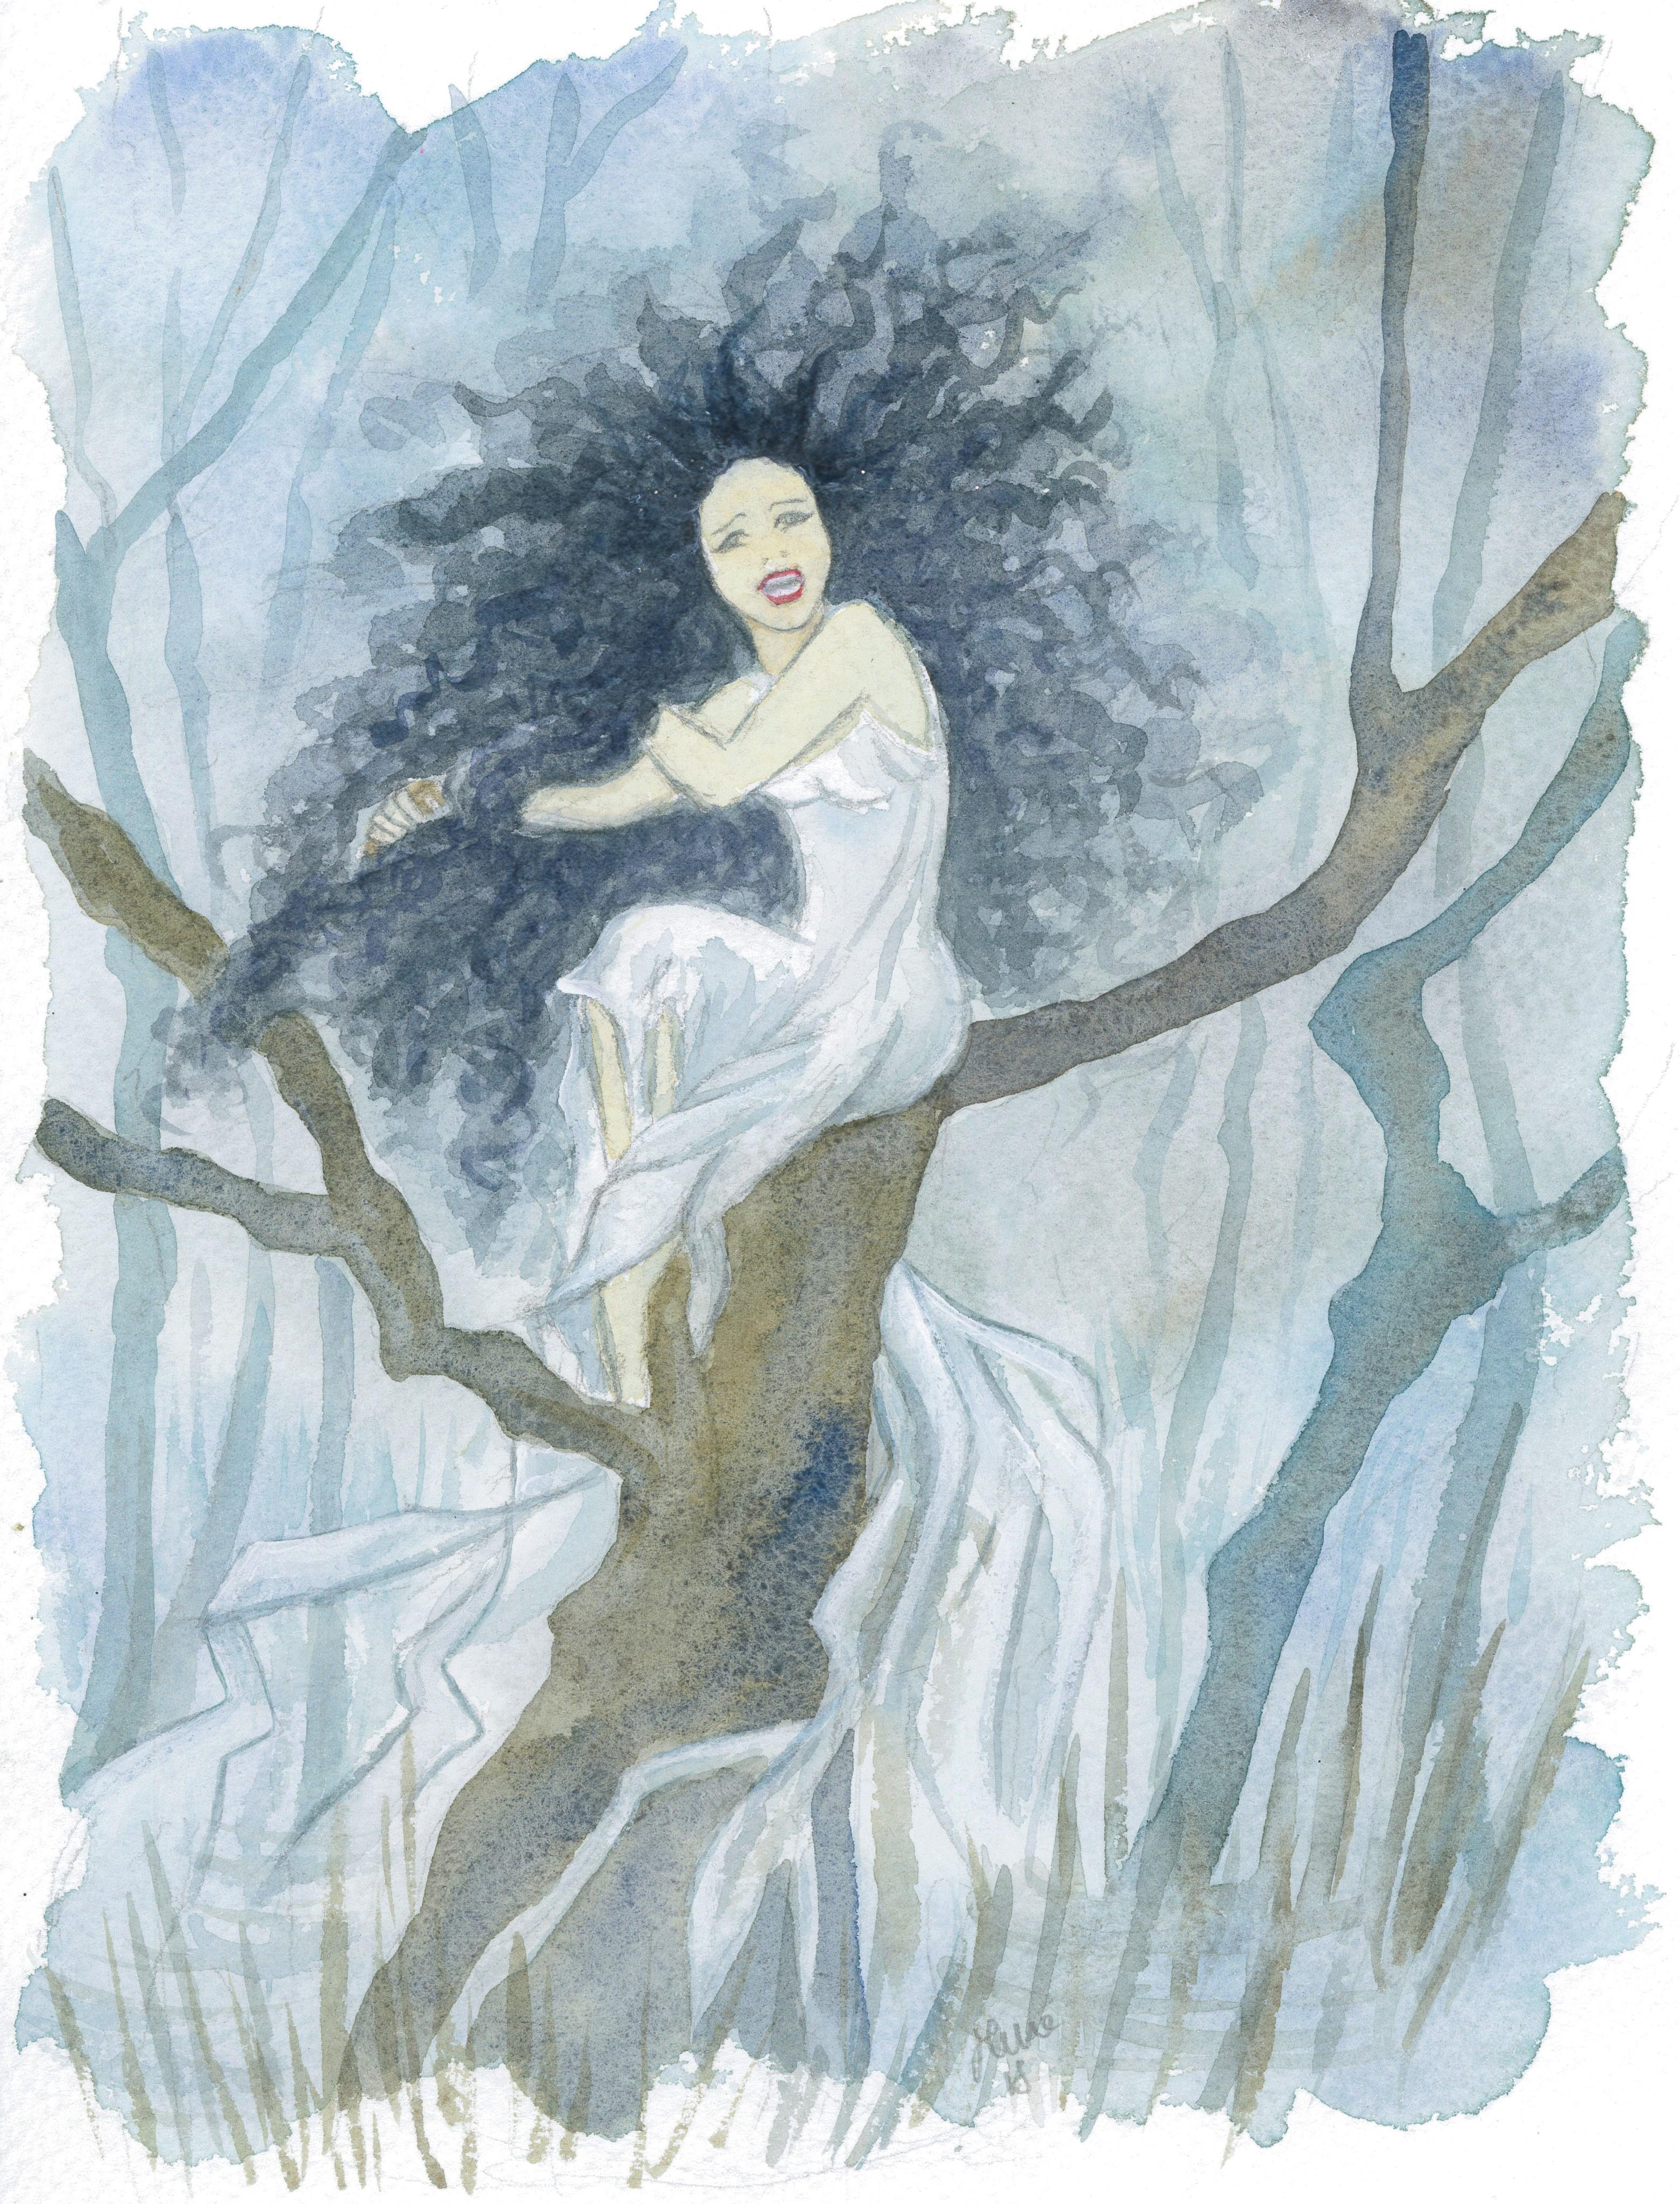 Banshee, dipinto di Silvia Dotti